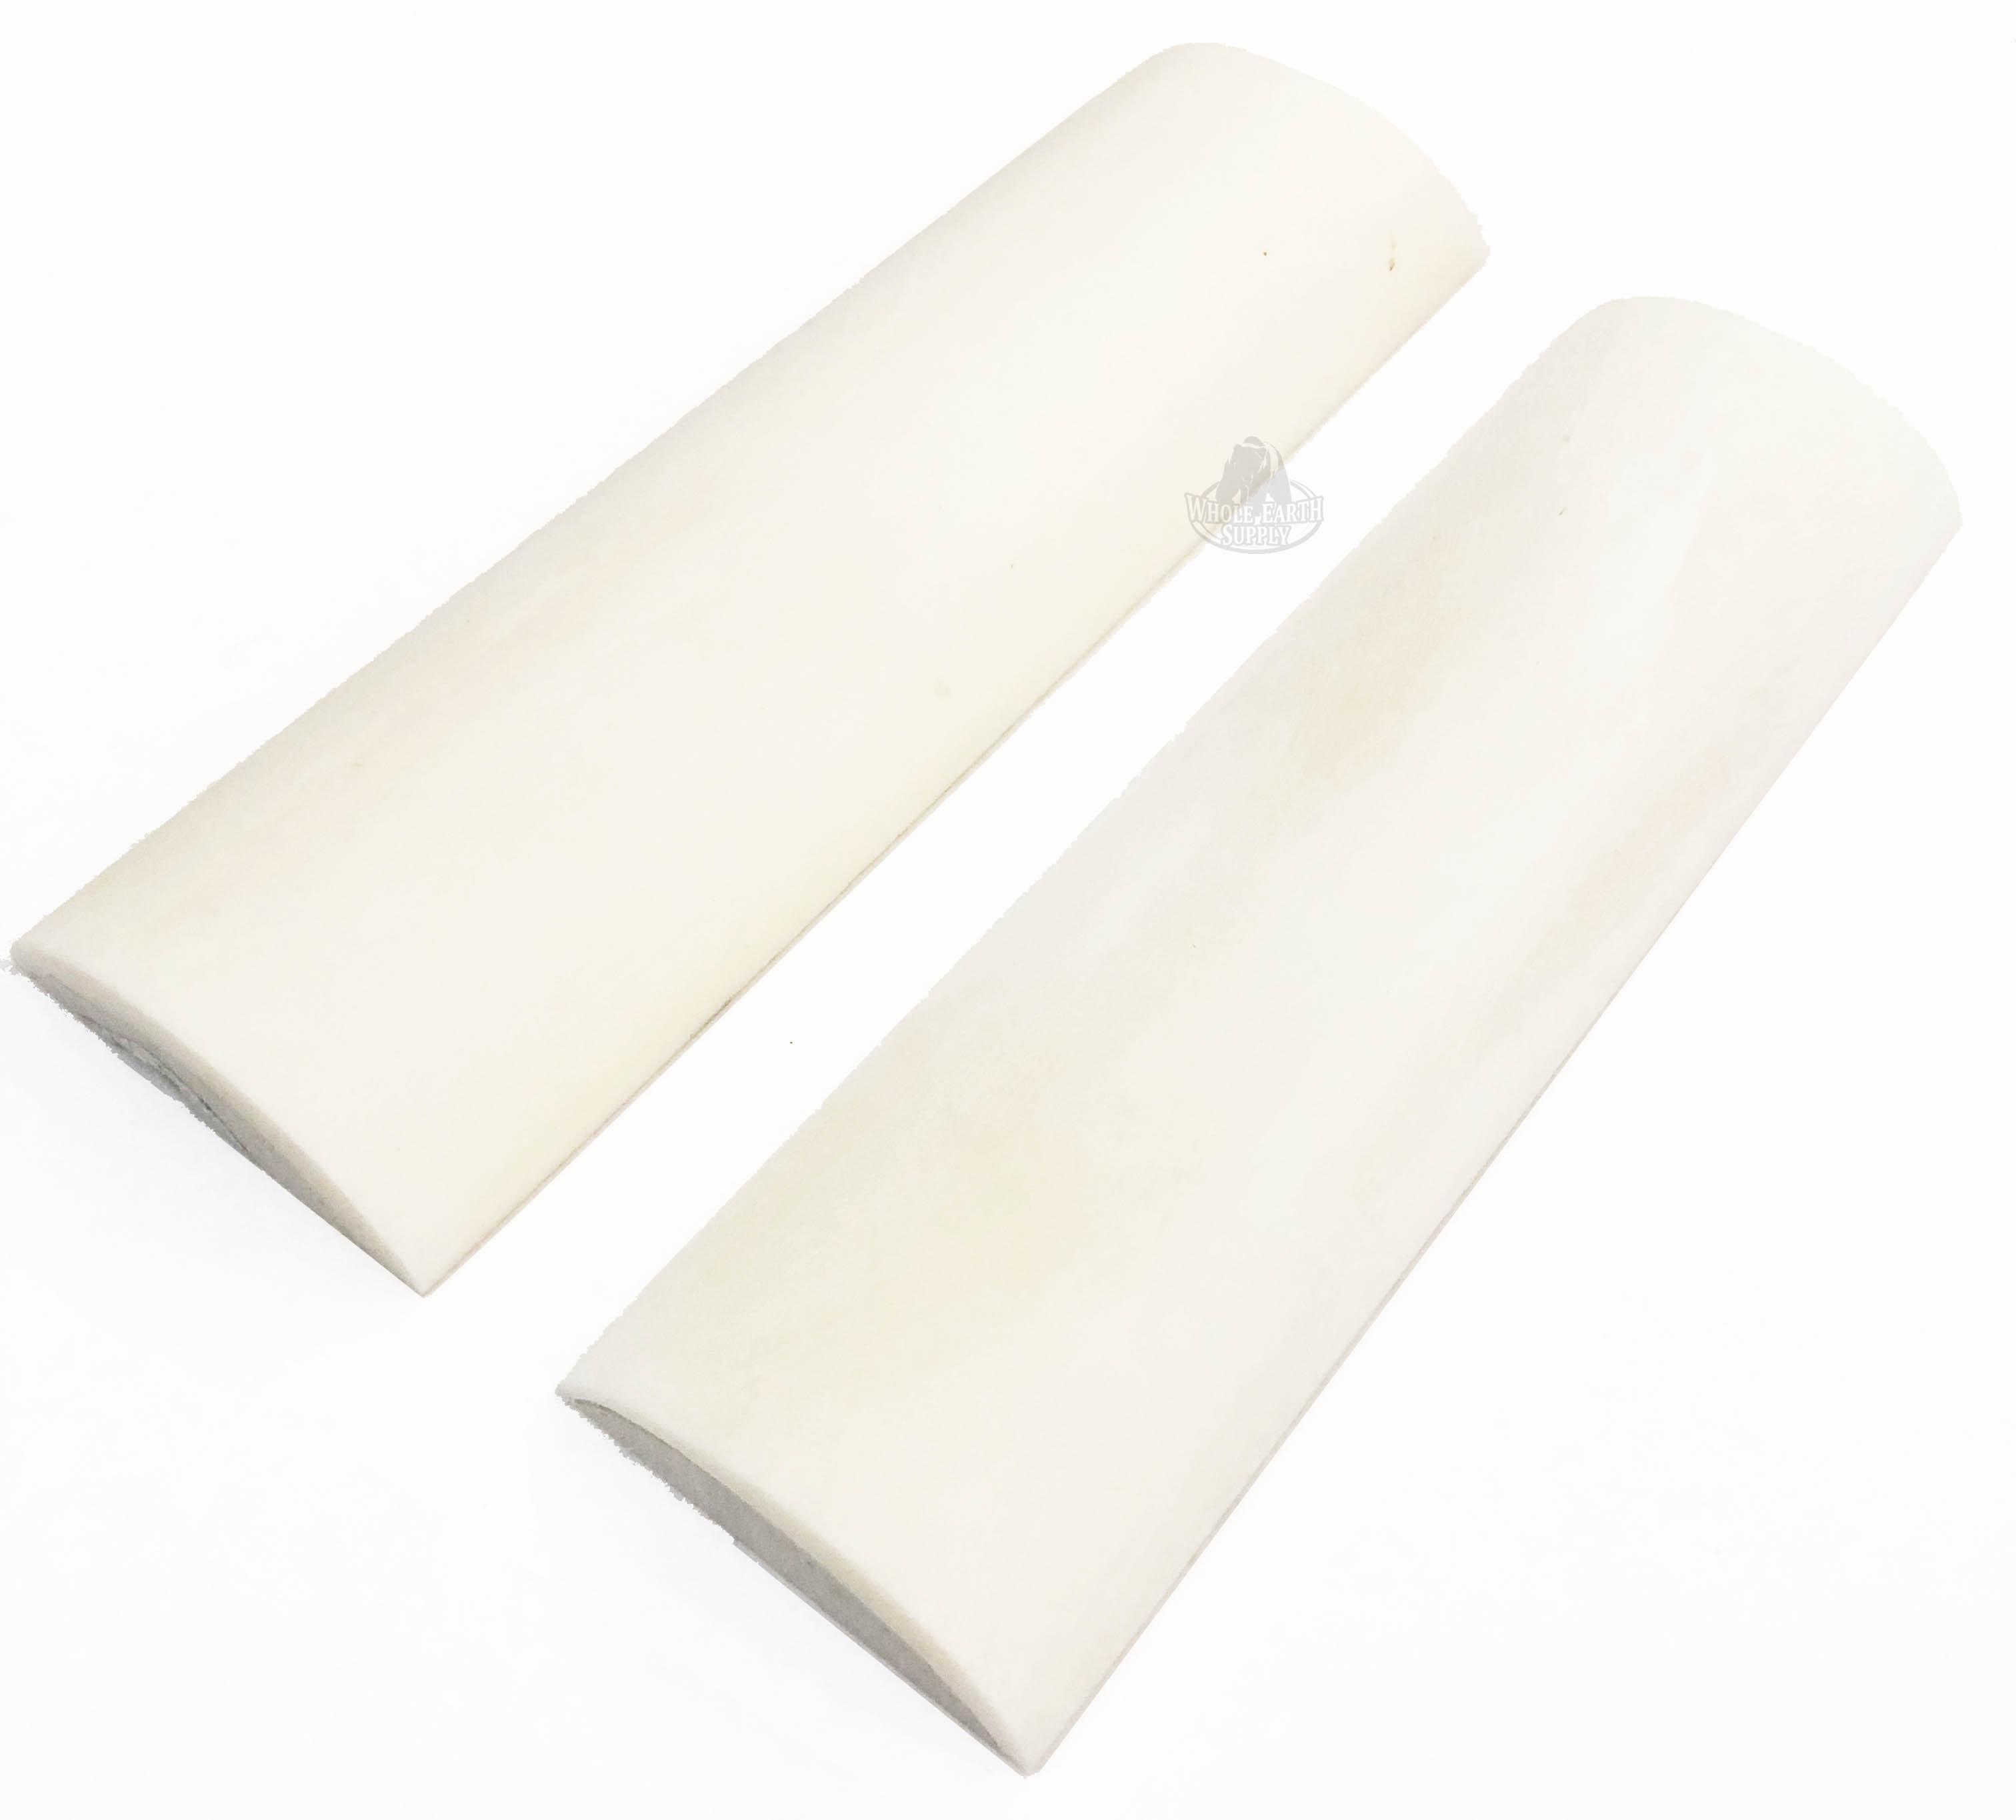 Blanksandblades Com 5 Inch Smooth White Camel Bone